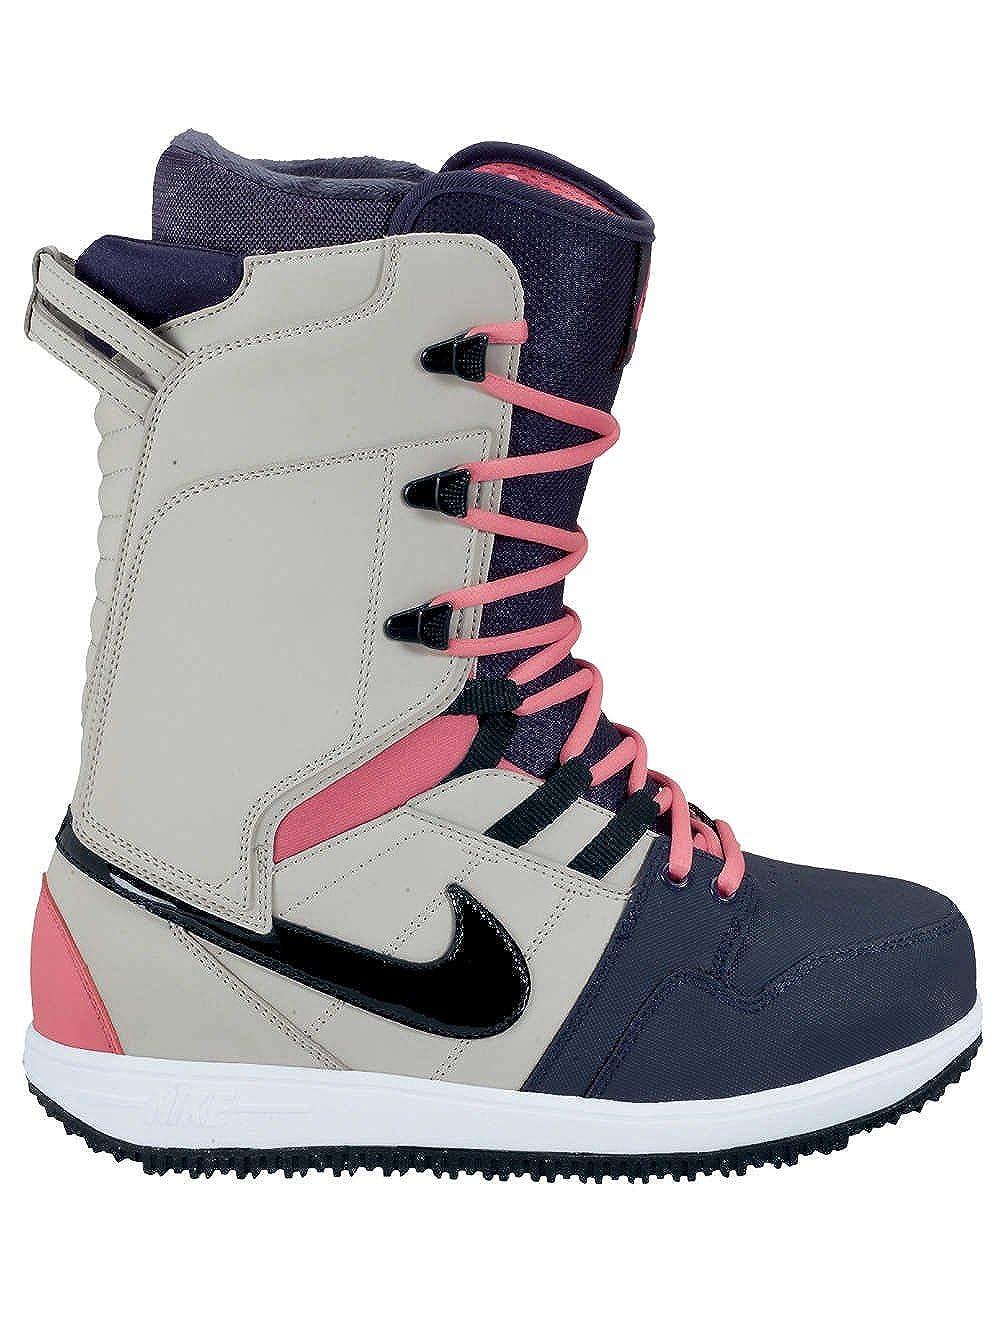 huge discount 763a6 d4a29 Amazon.com   Jordan Nike Air 11 Retro Low  Barons    Sneakers